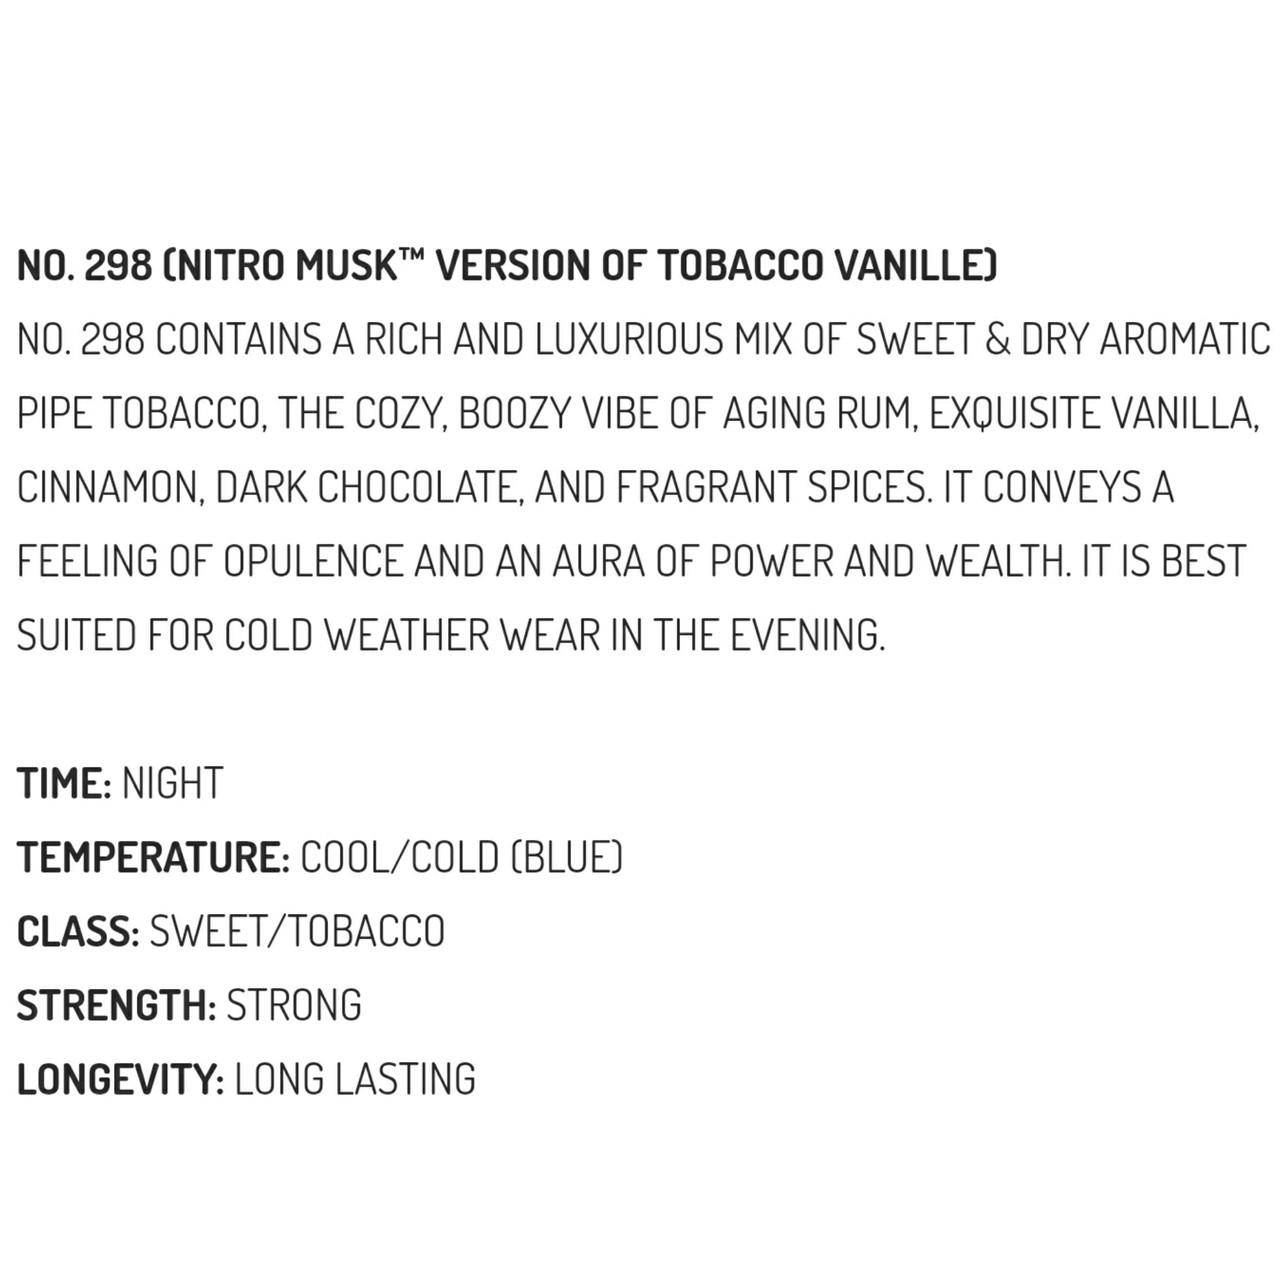 Musk & Hustle No. 298 Nitro Pen (Version of Tobacco Vanille)